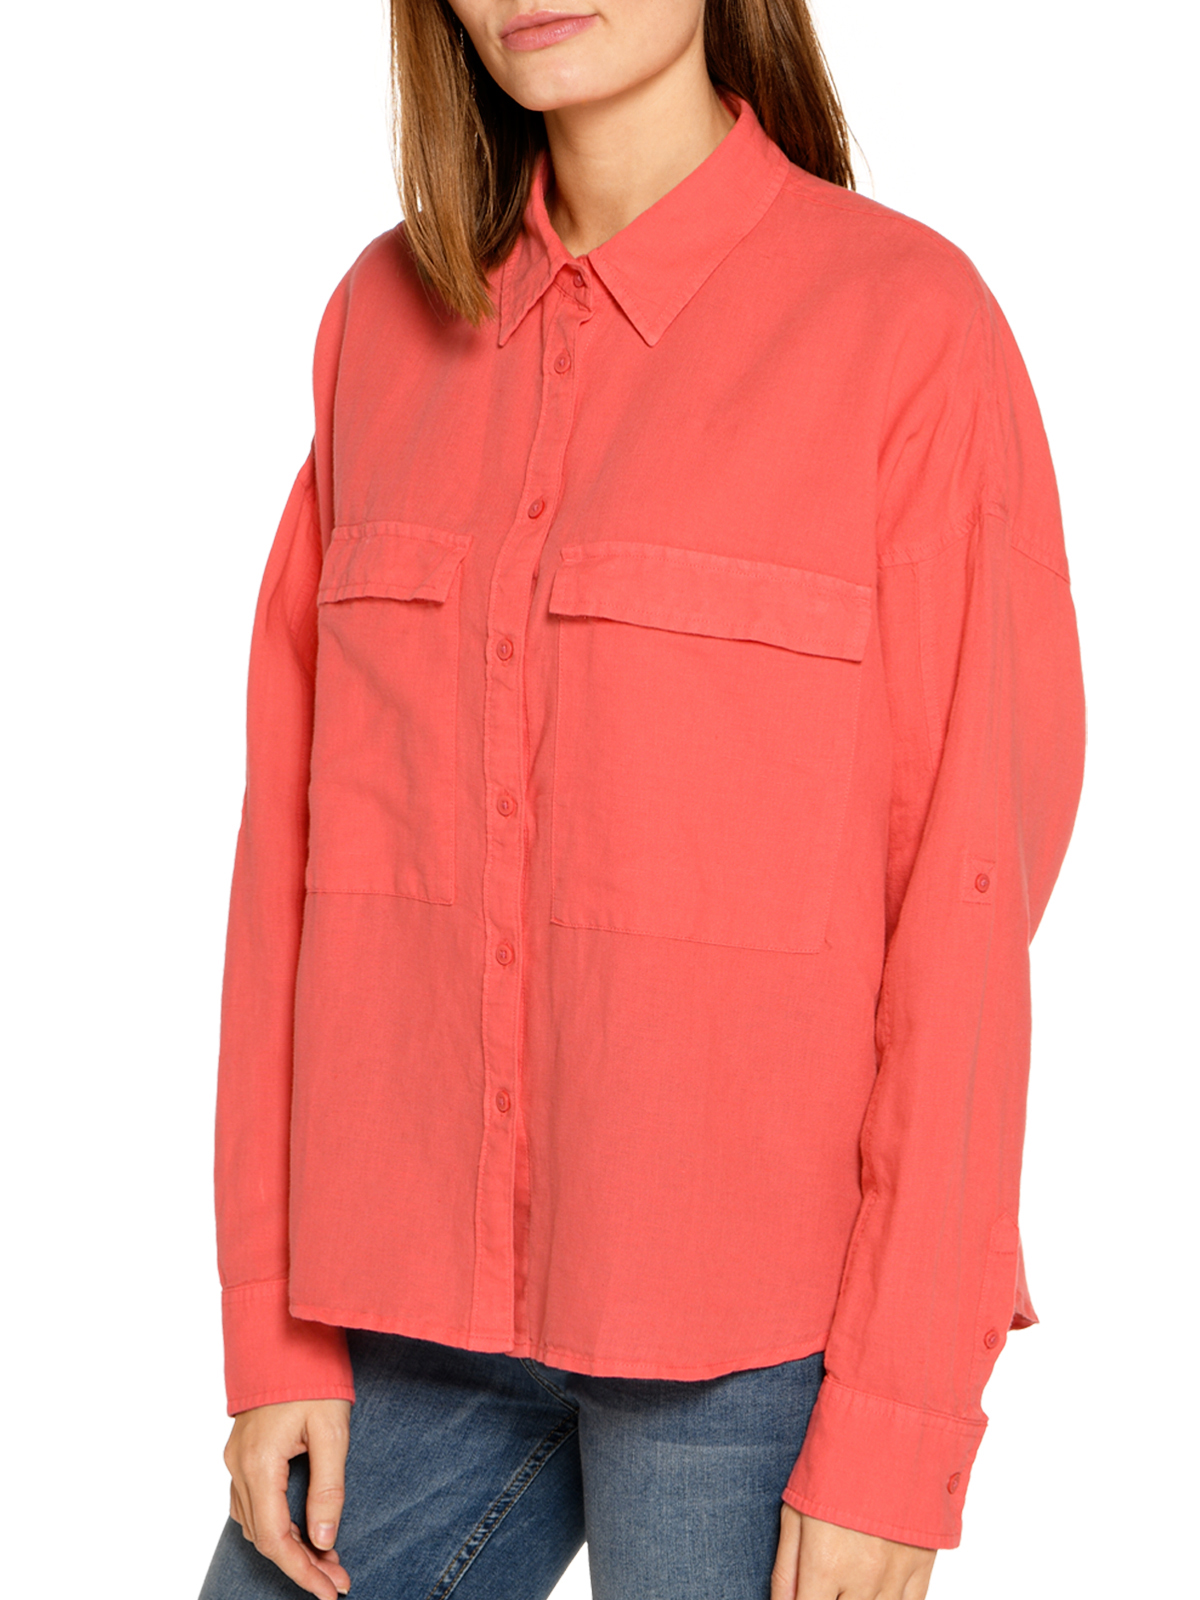 Wrangler Blouse in oranje voor Dames